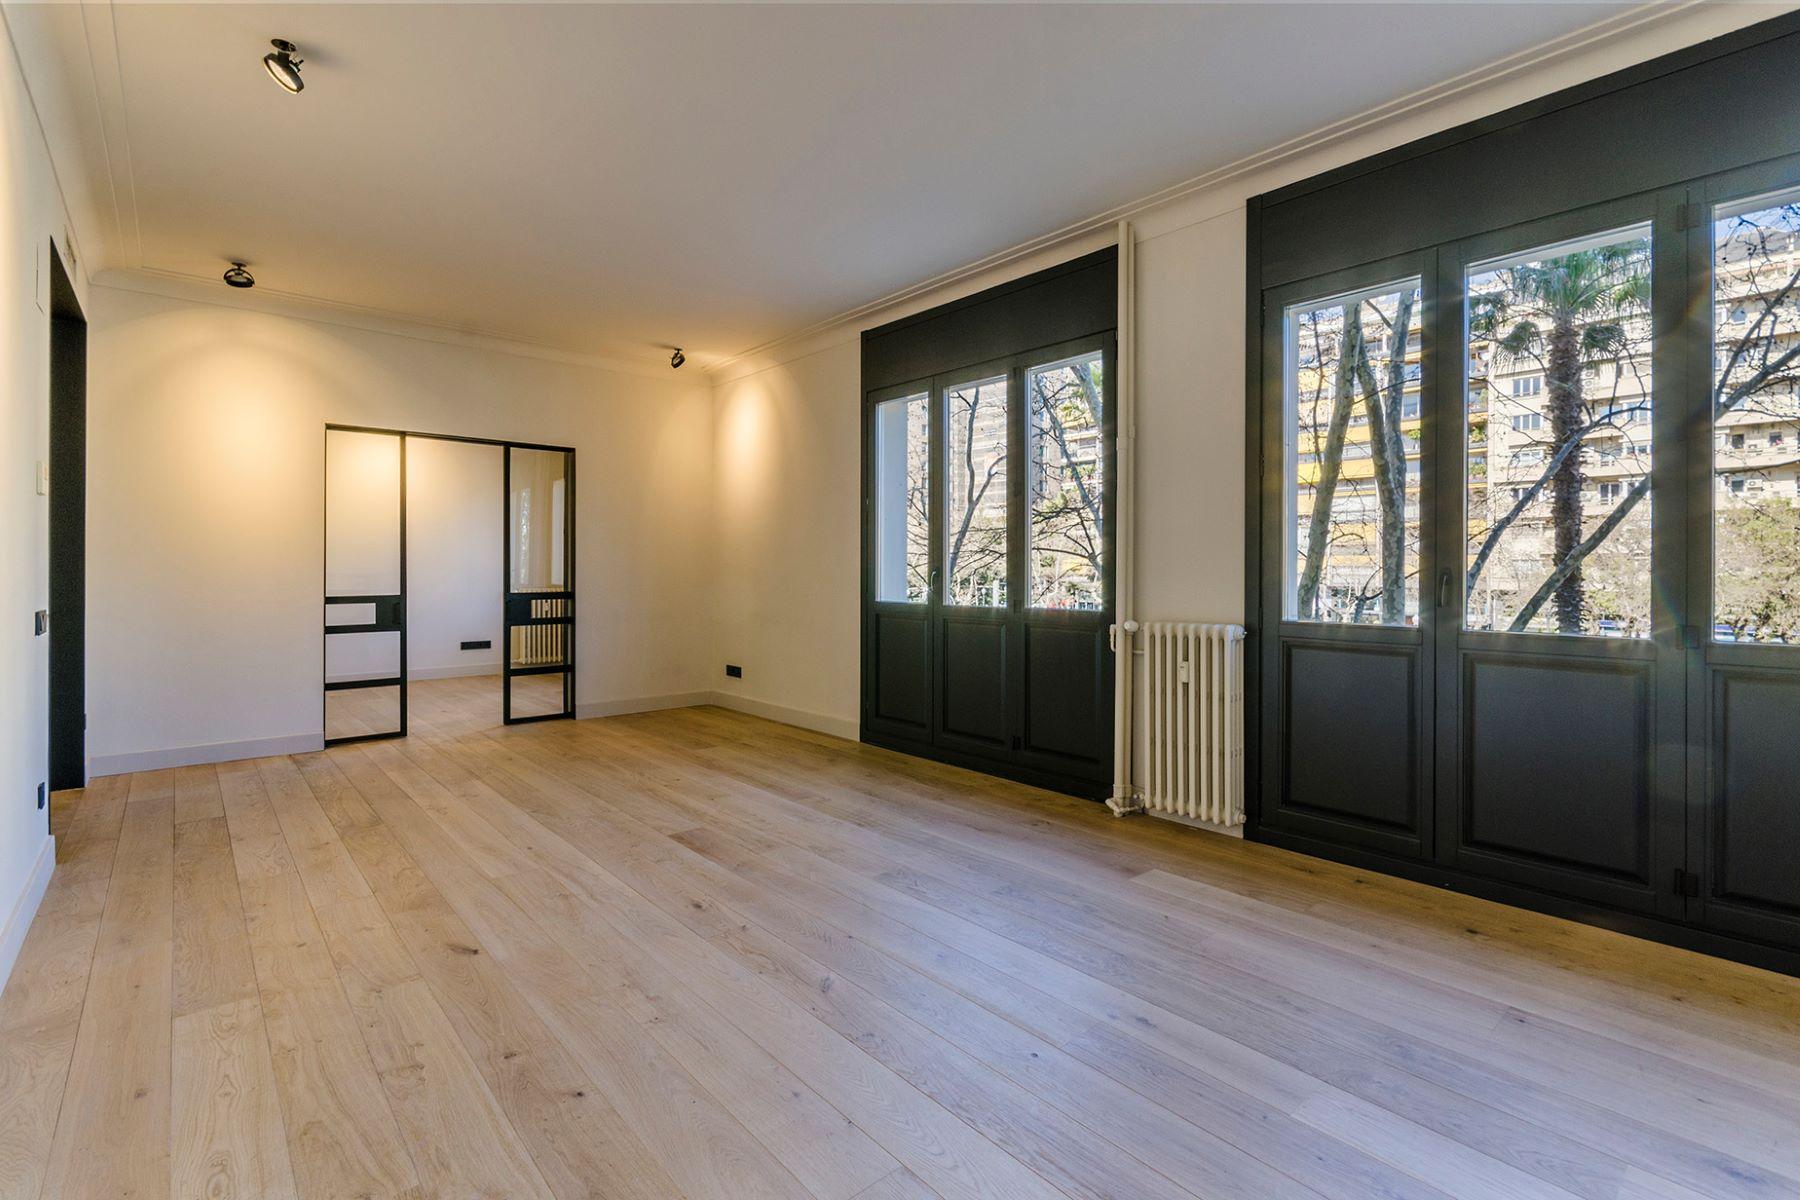 公寓 為 出售 在 Spectacular renovated apartment a few meters from Turó Park Barcelona City, Barcelona, 08034 西班牙